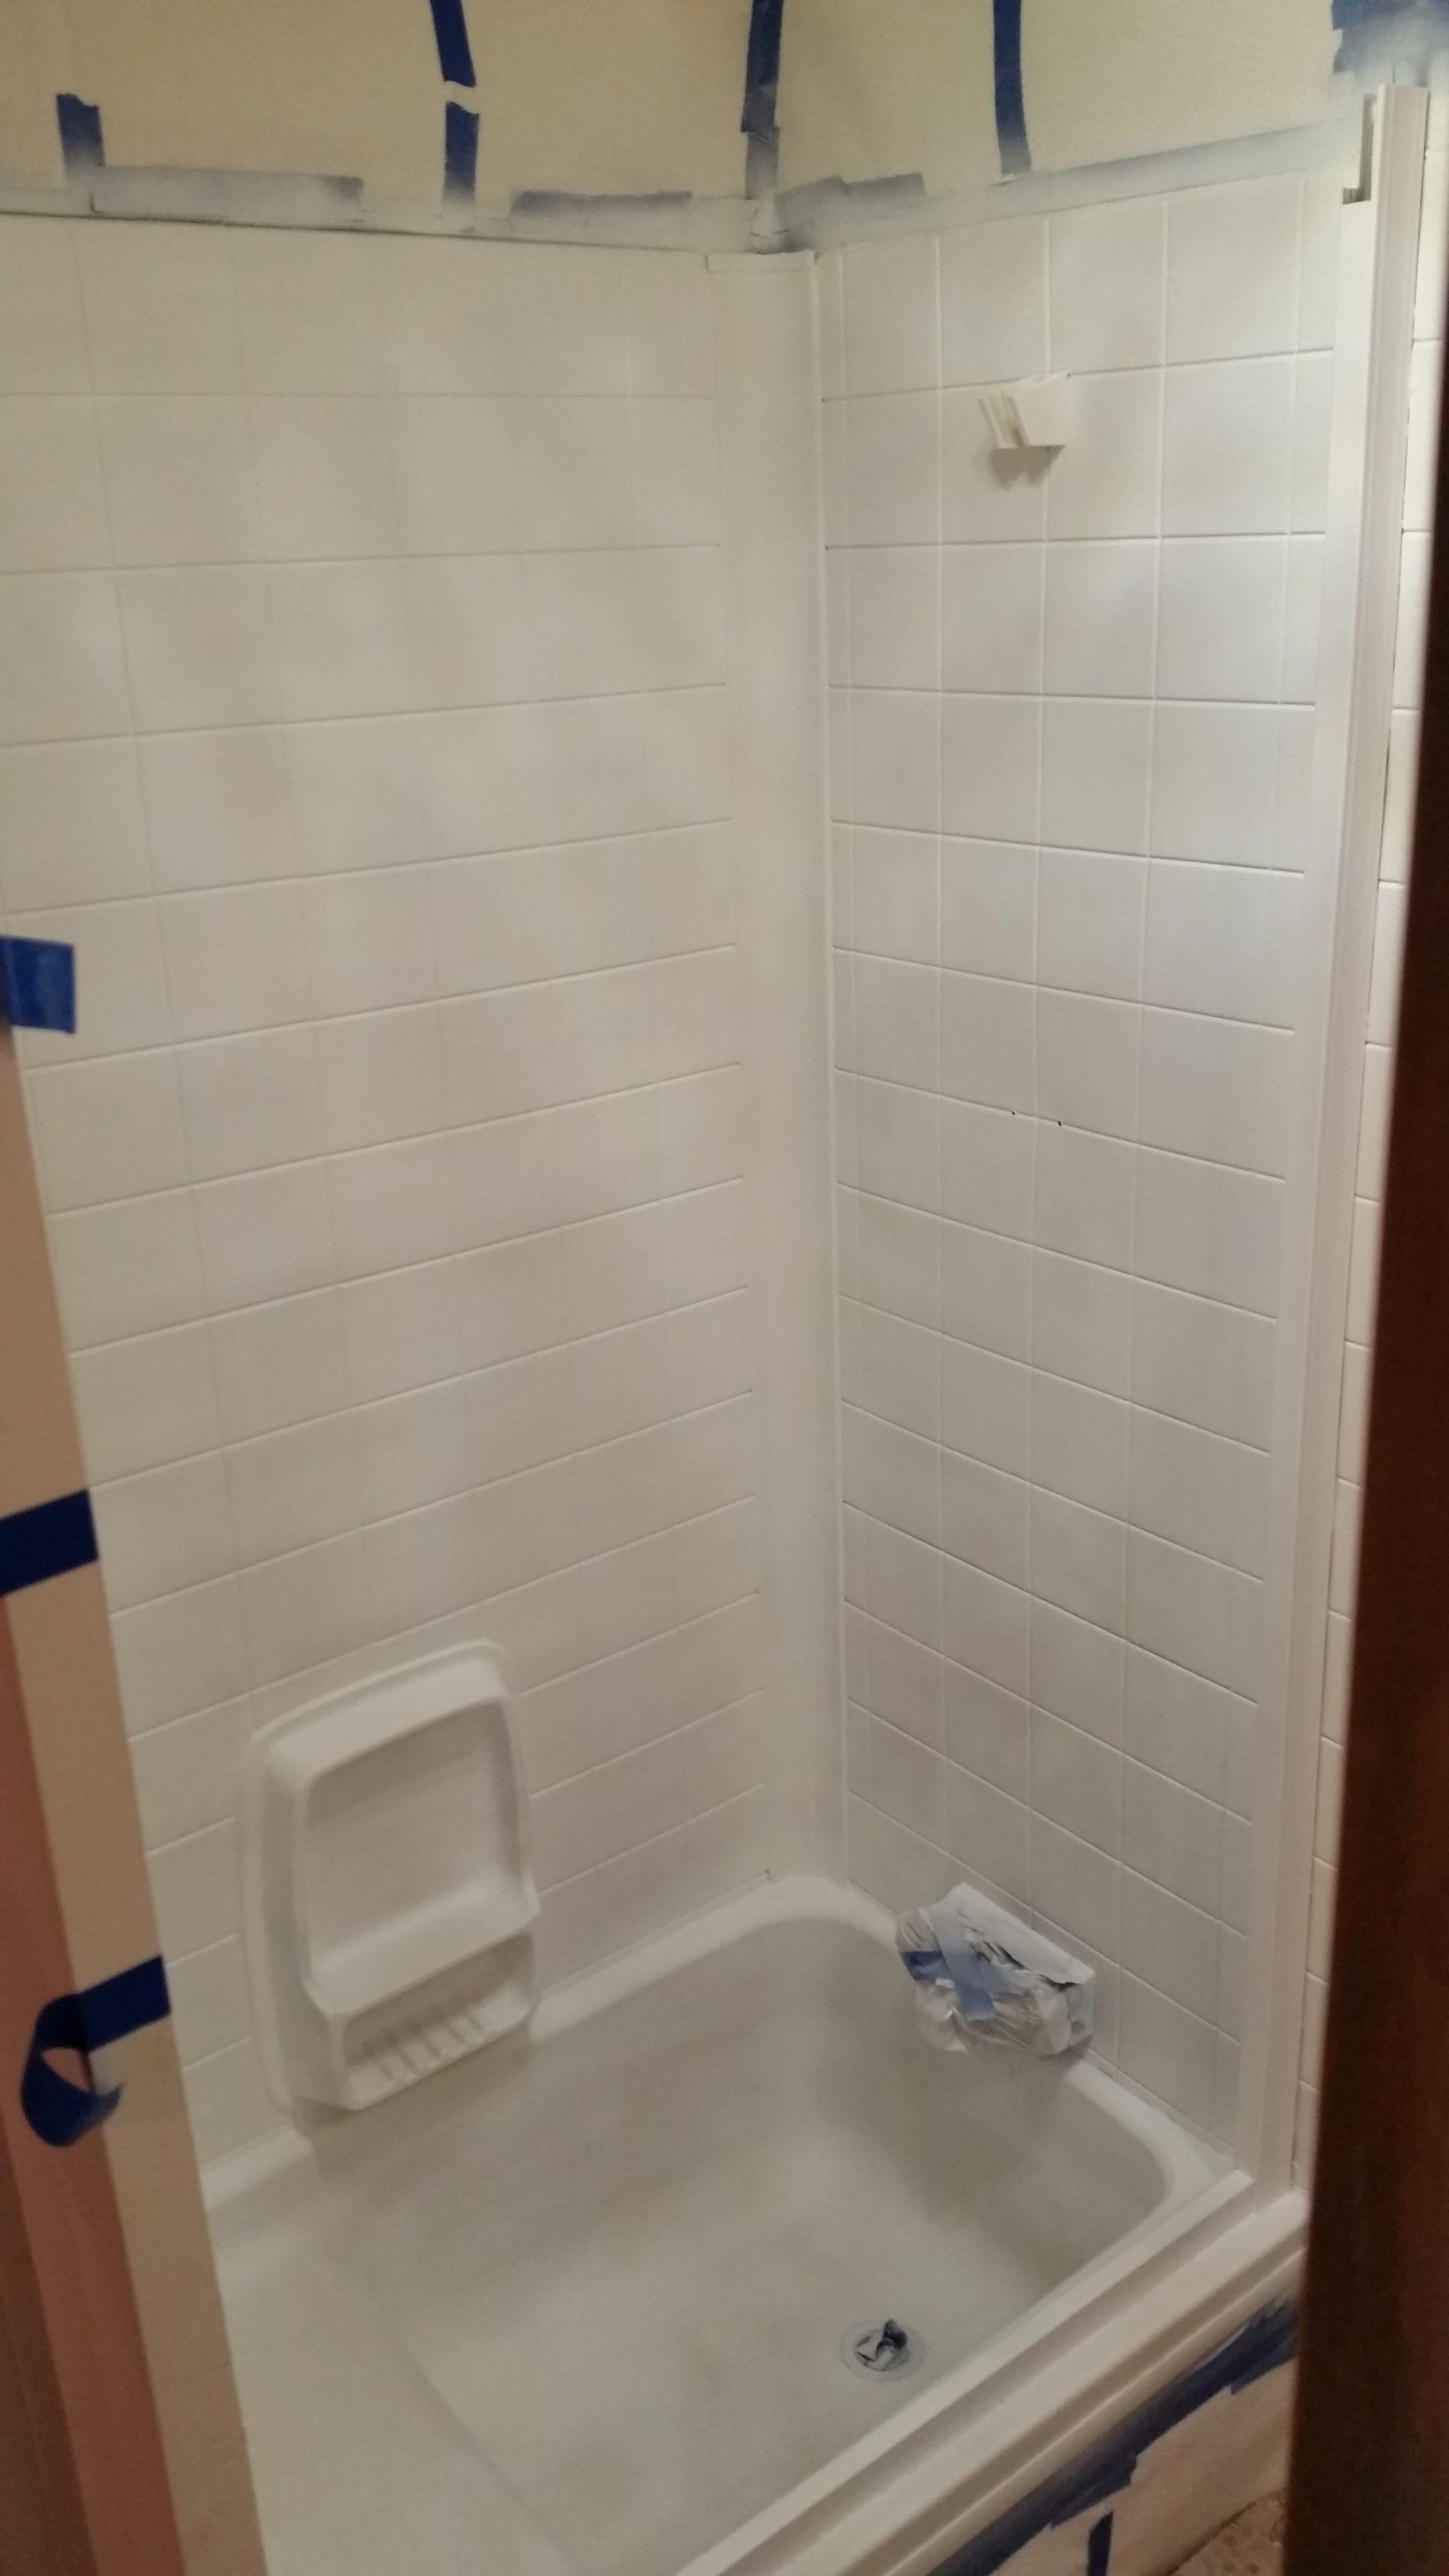 RV Bathroom Remodel The Shower Nurse Barb Blog Before And - Bathroom shower remodel on a budget